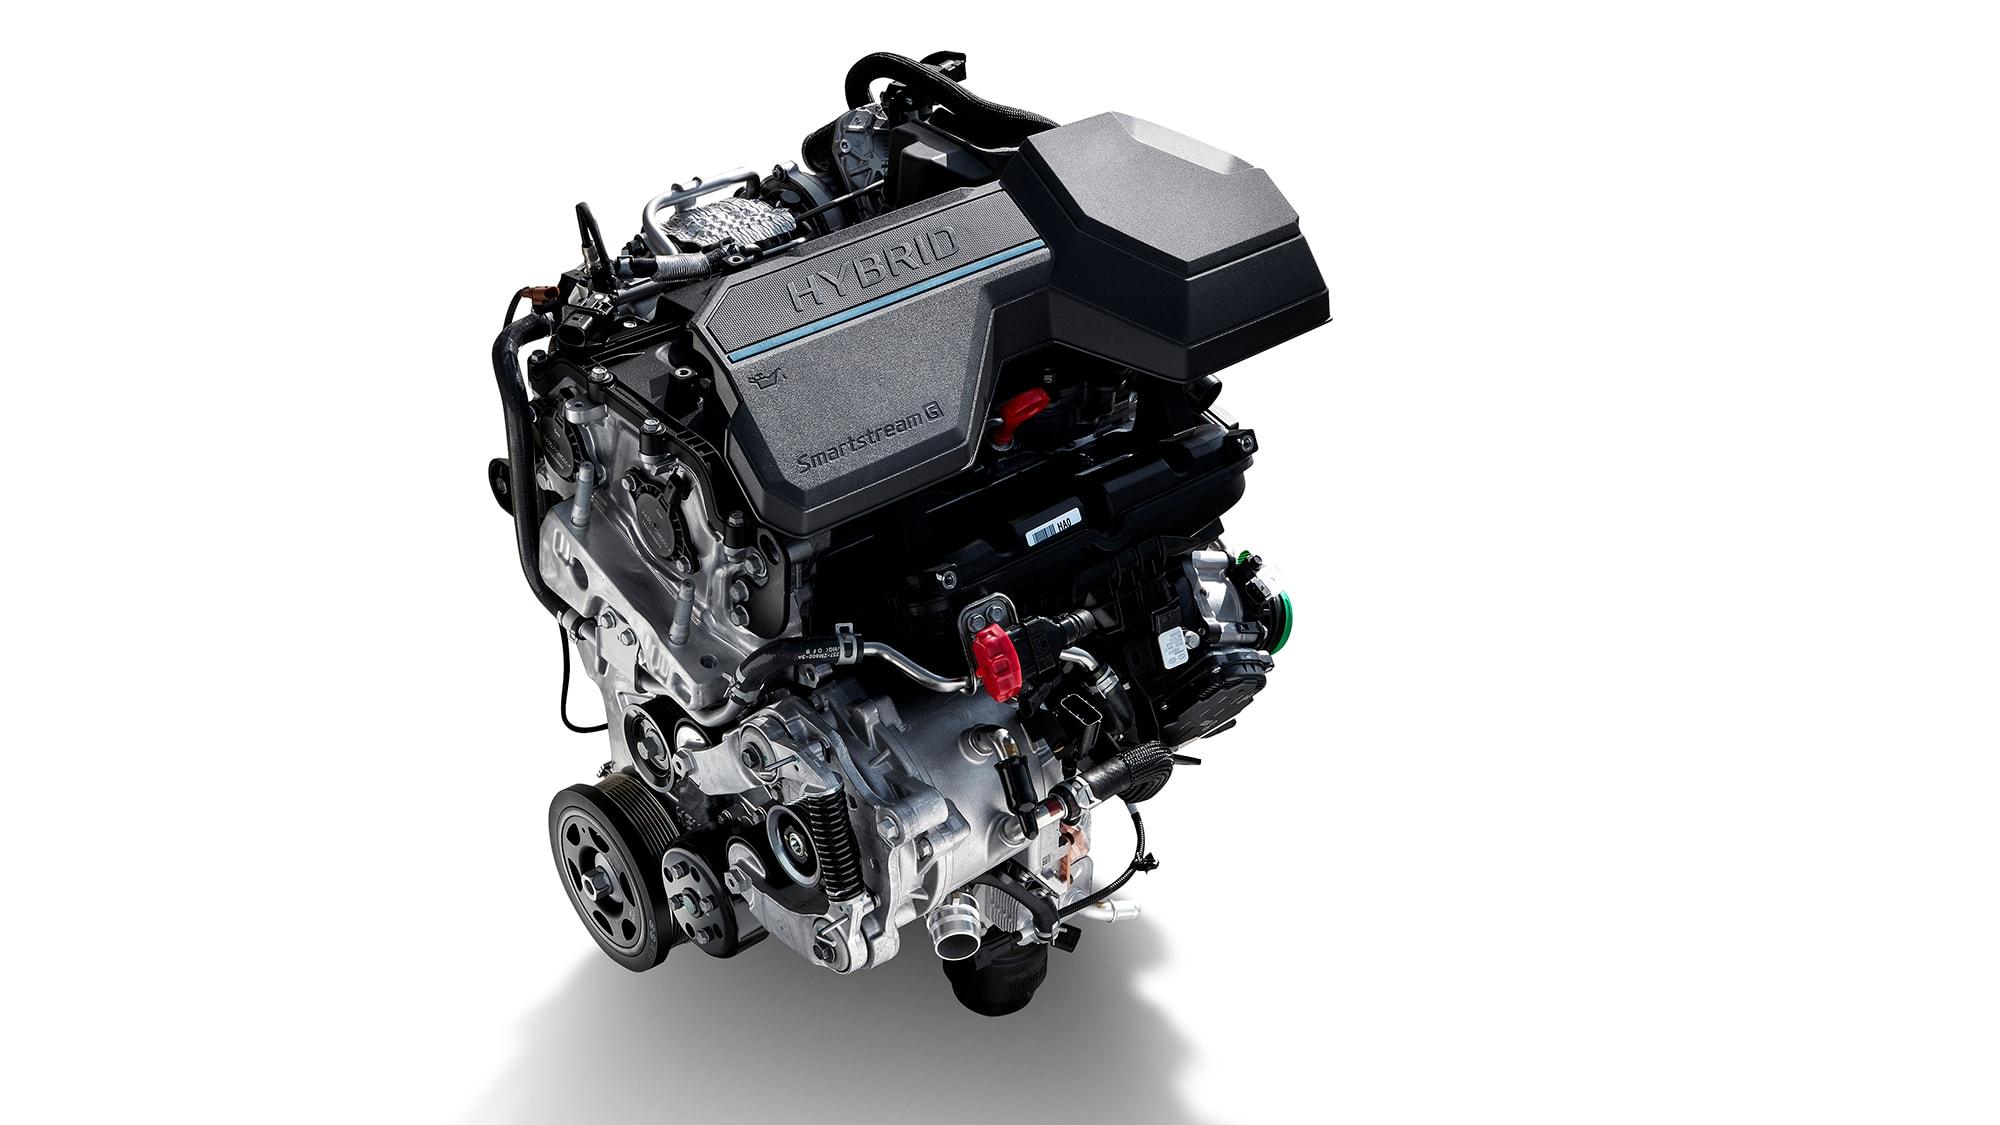 2021 Kia Sorento engines detailed: 2.2 diesel, 3.5 petrol ...